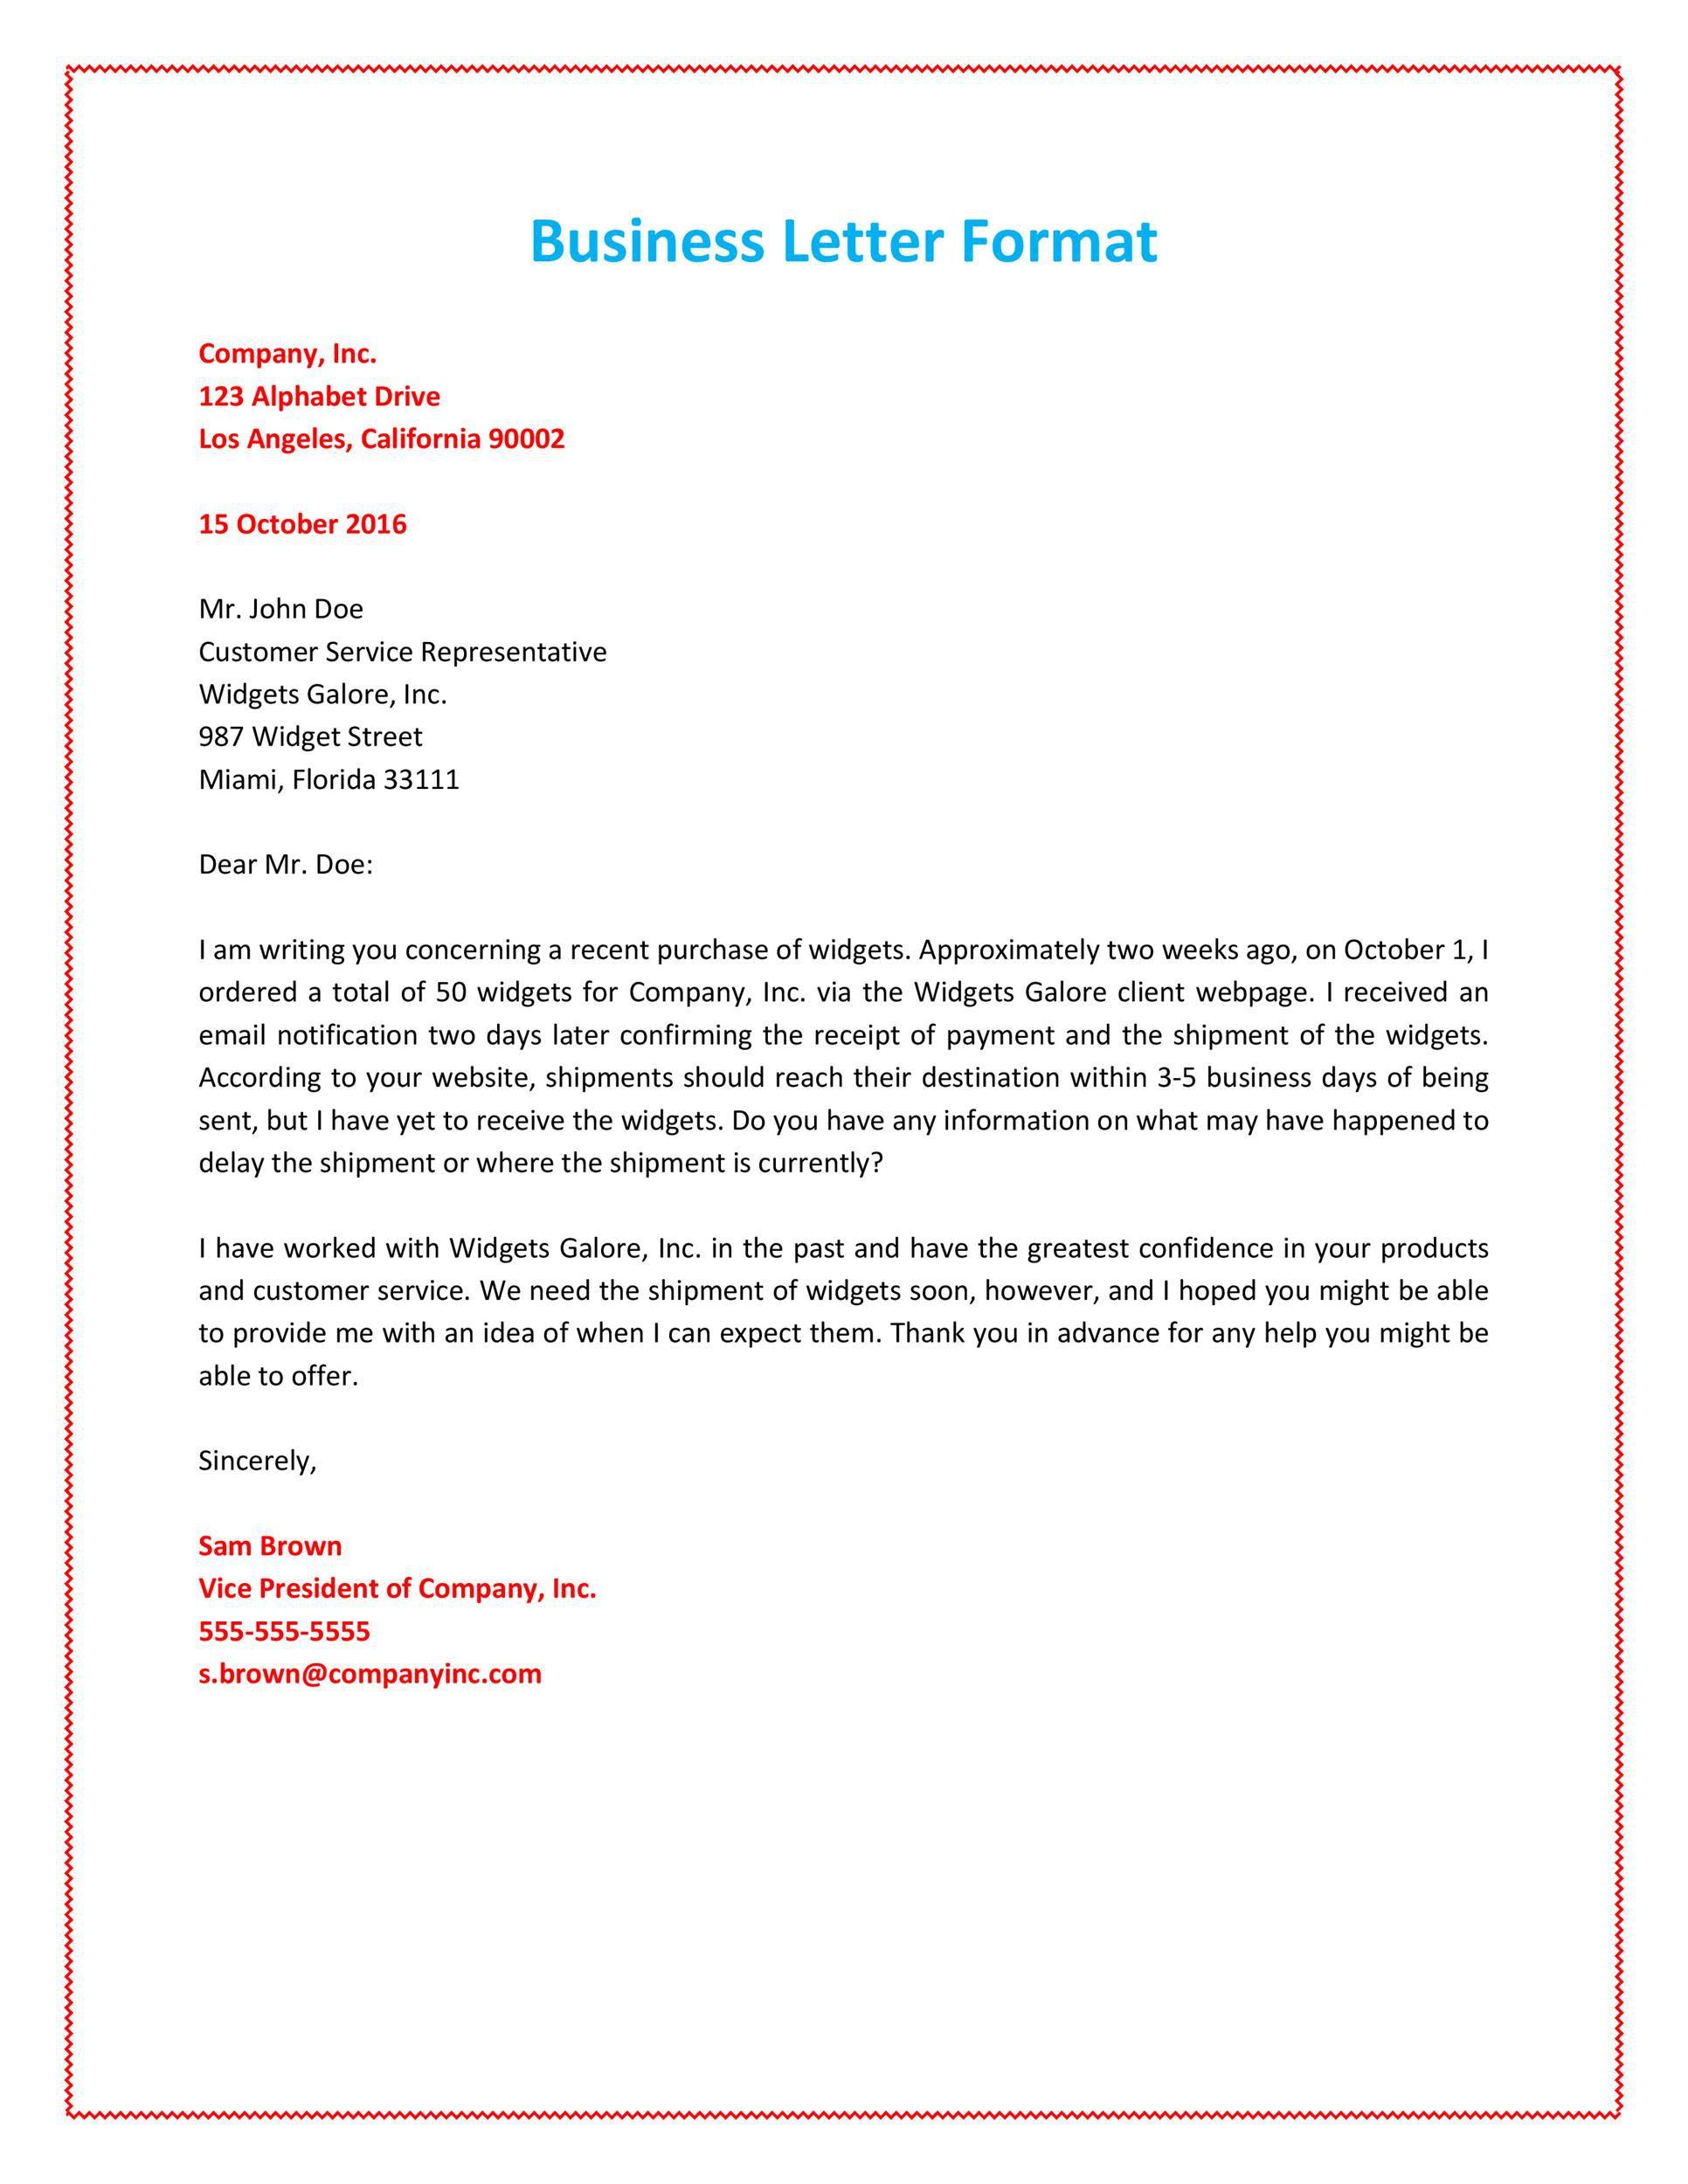 011 Marvelou Busines Letter Template Word Sample  Cover FreeFull